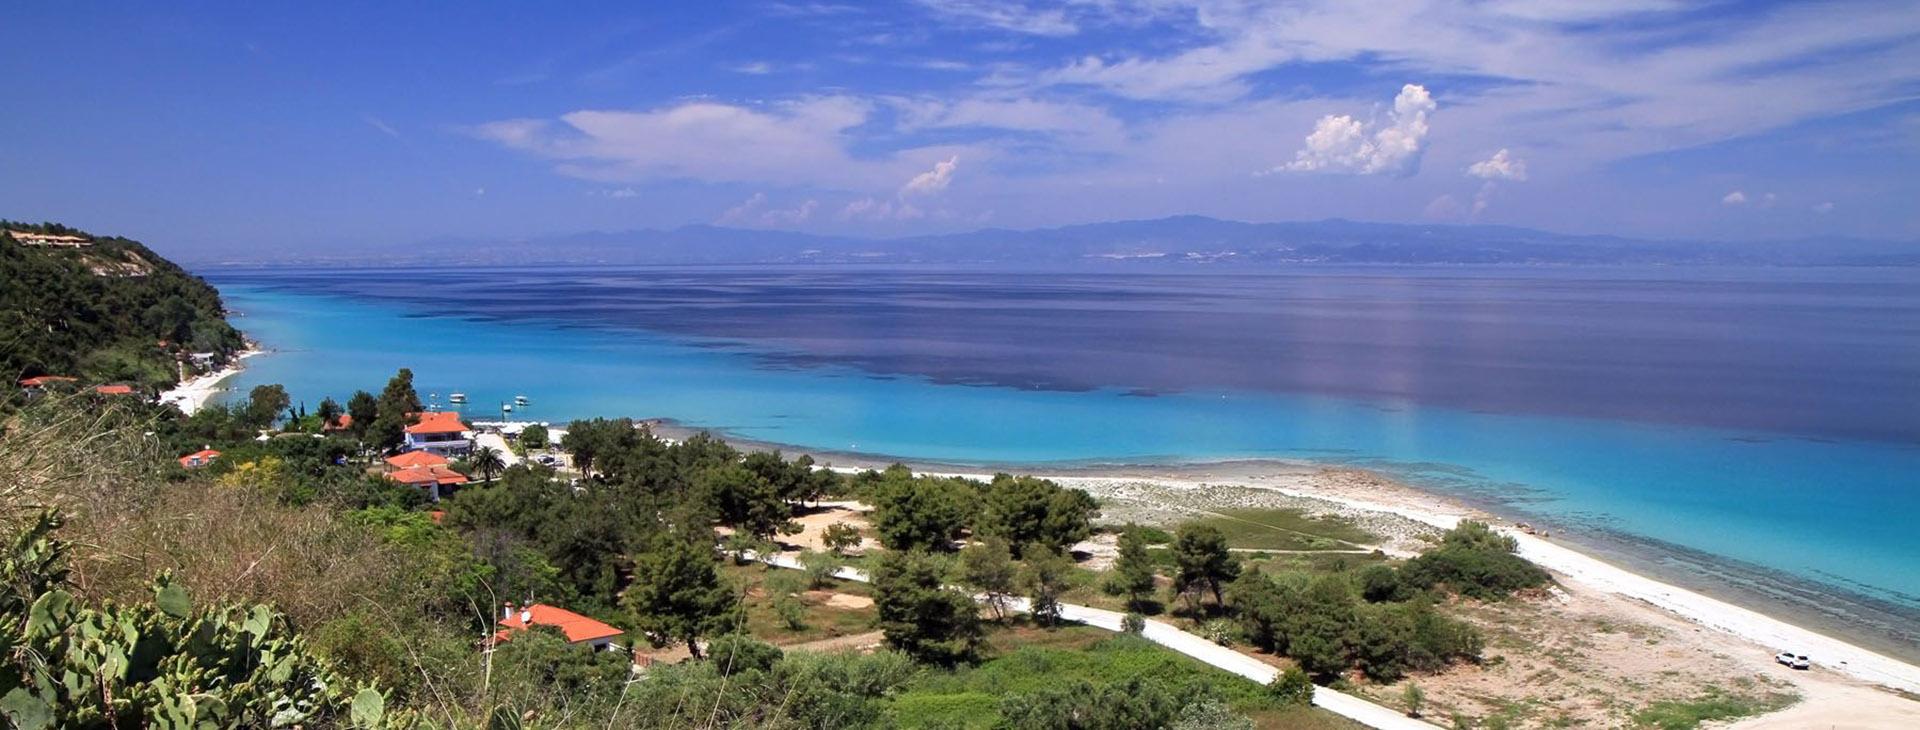 Afitos, Kassandra, Halkidiki (Chalkidiki)